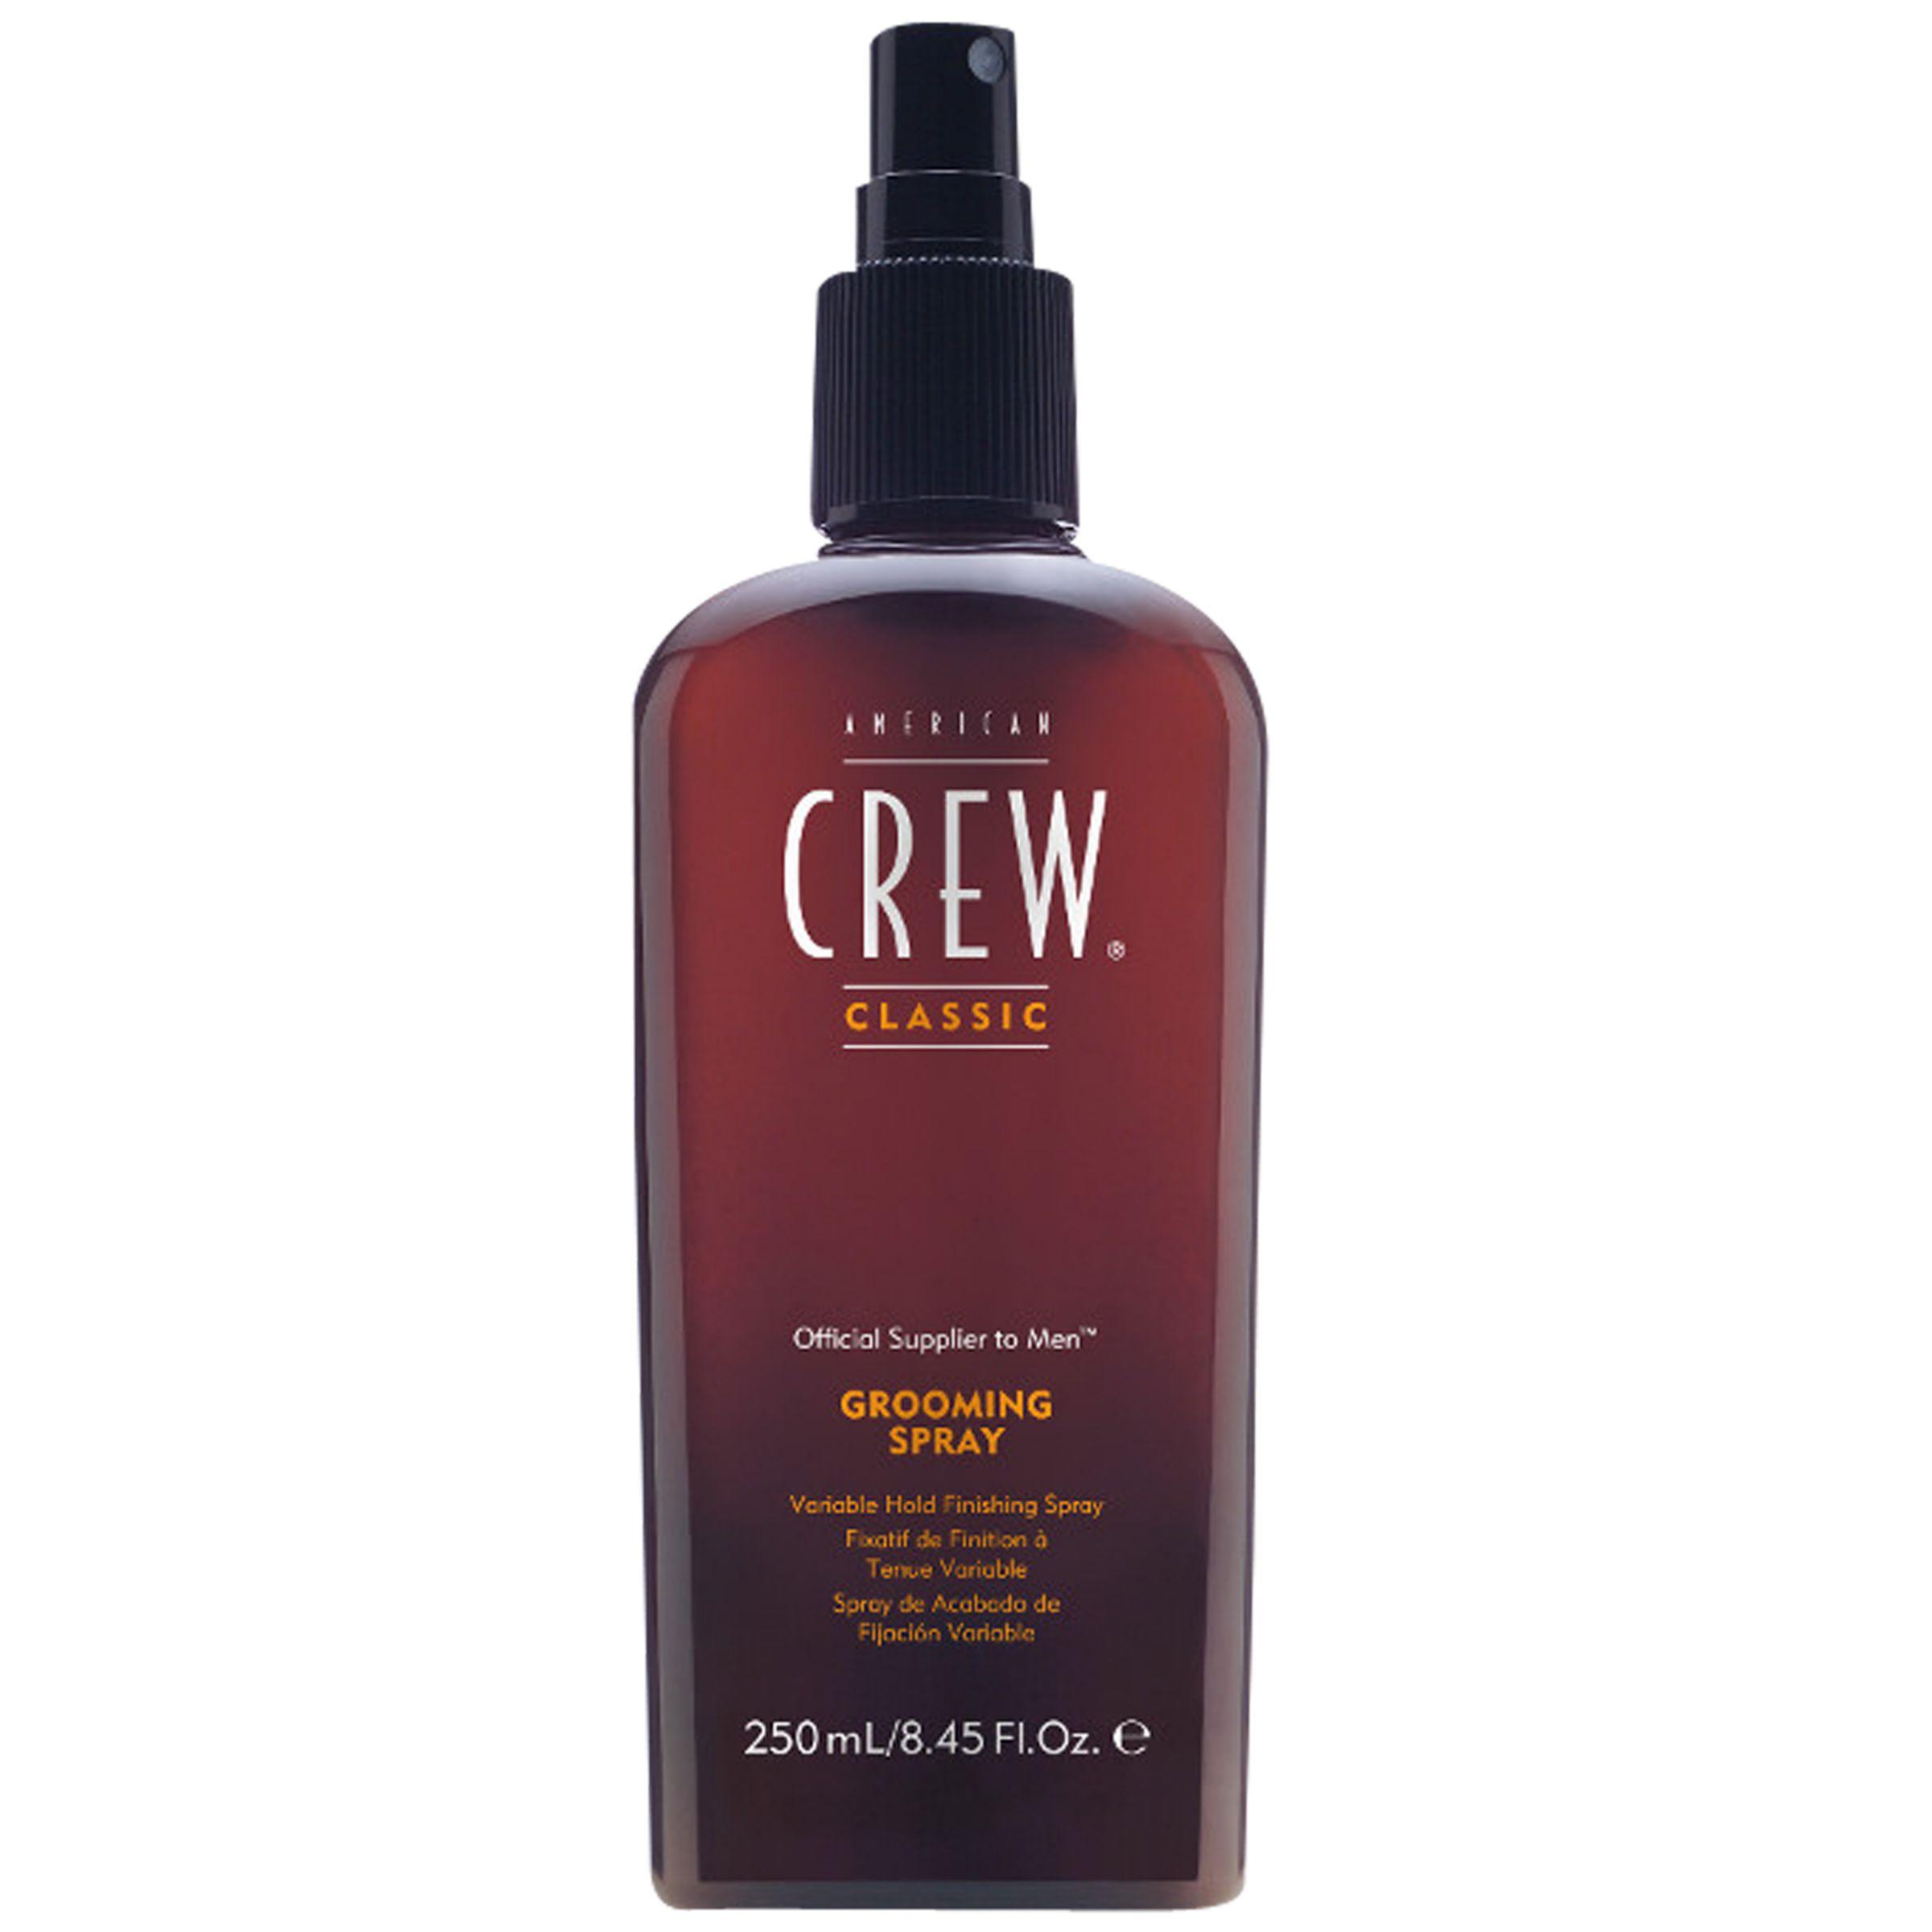 American Crew American Crew Classic Grooming Spray, 250ml